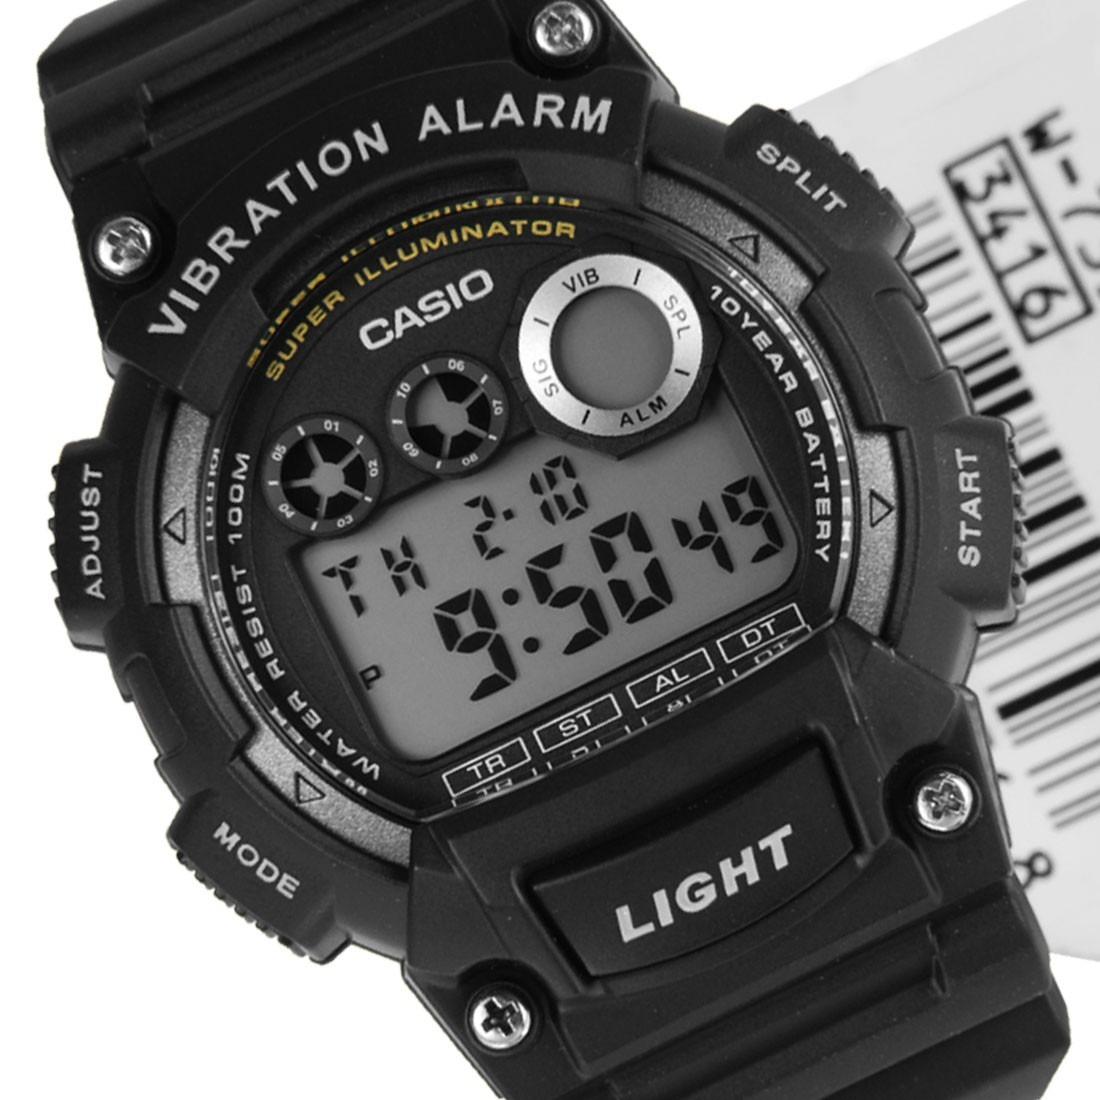 c9fc13f5c6c0 Reloj Deportivo Juvenil Casio W-735h Negro Vibration -   33.990 en ...